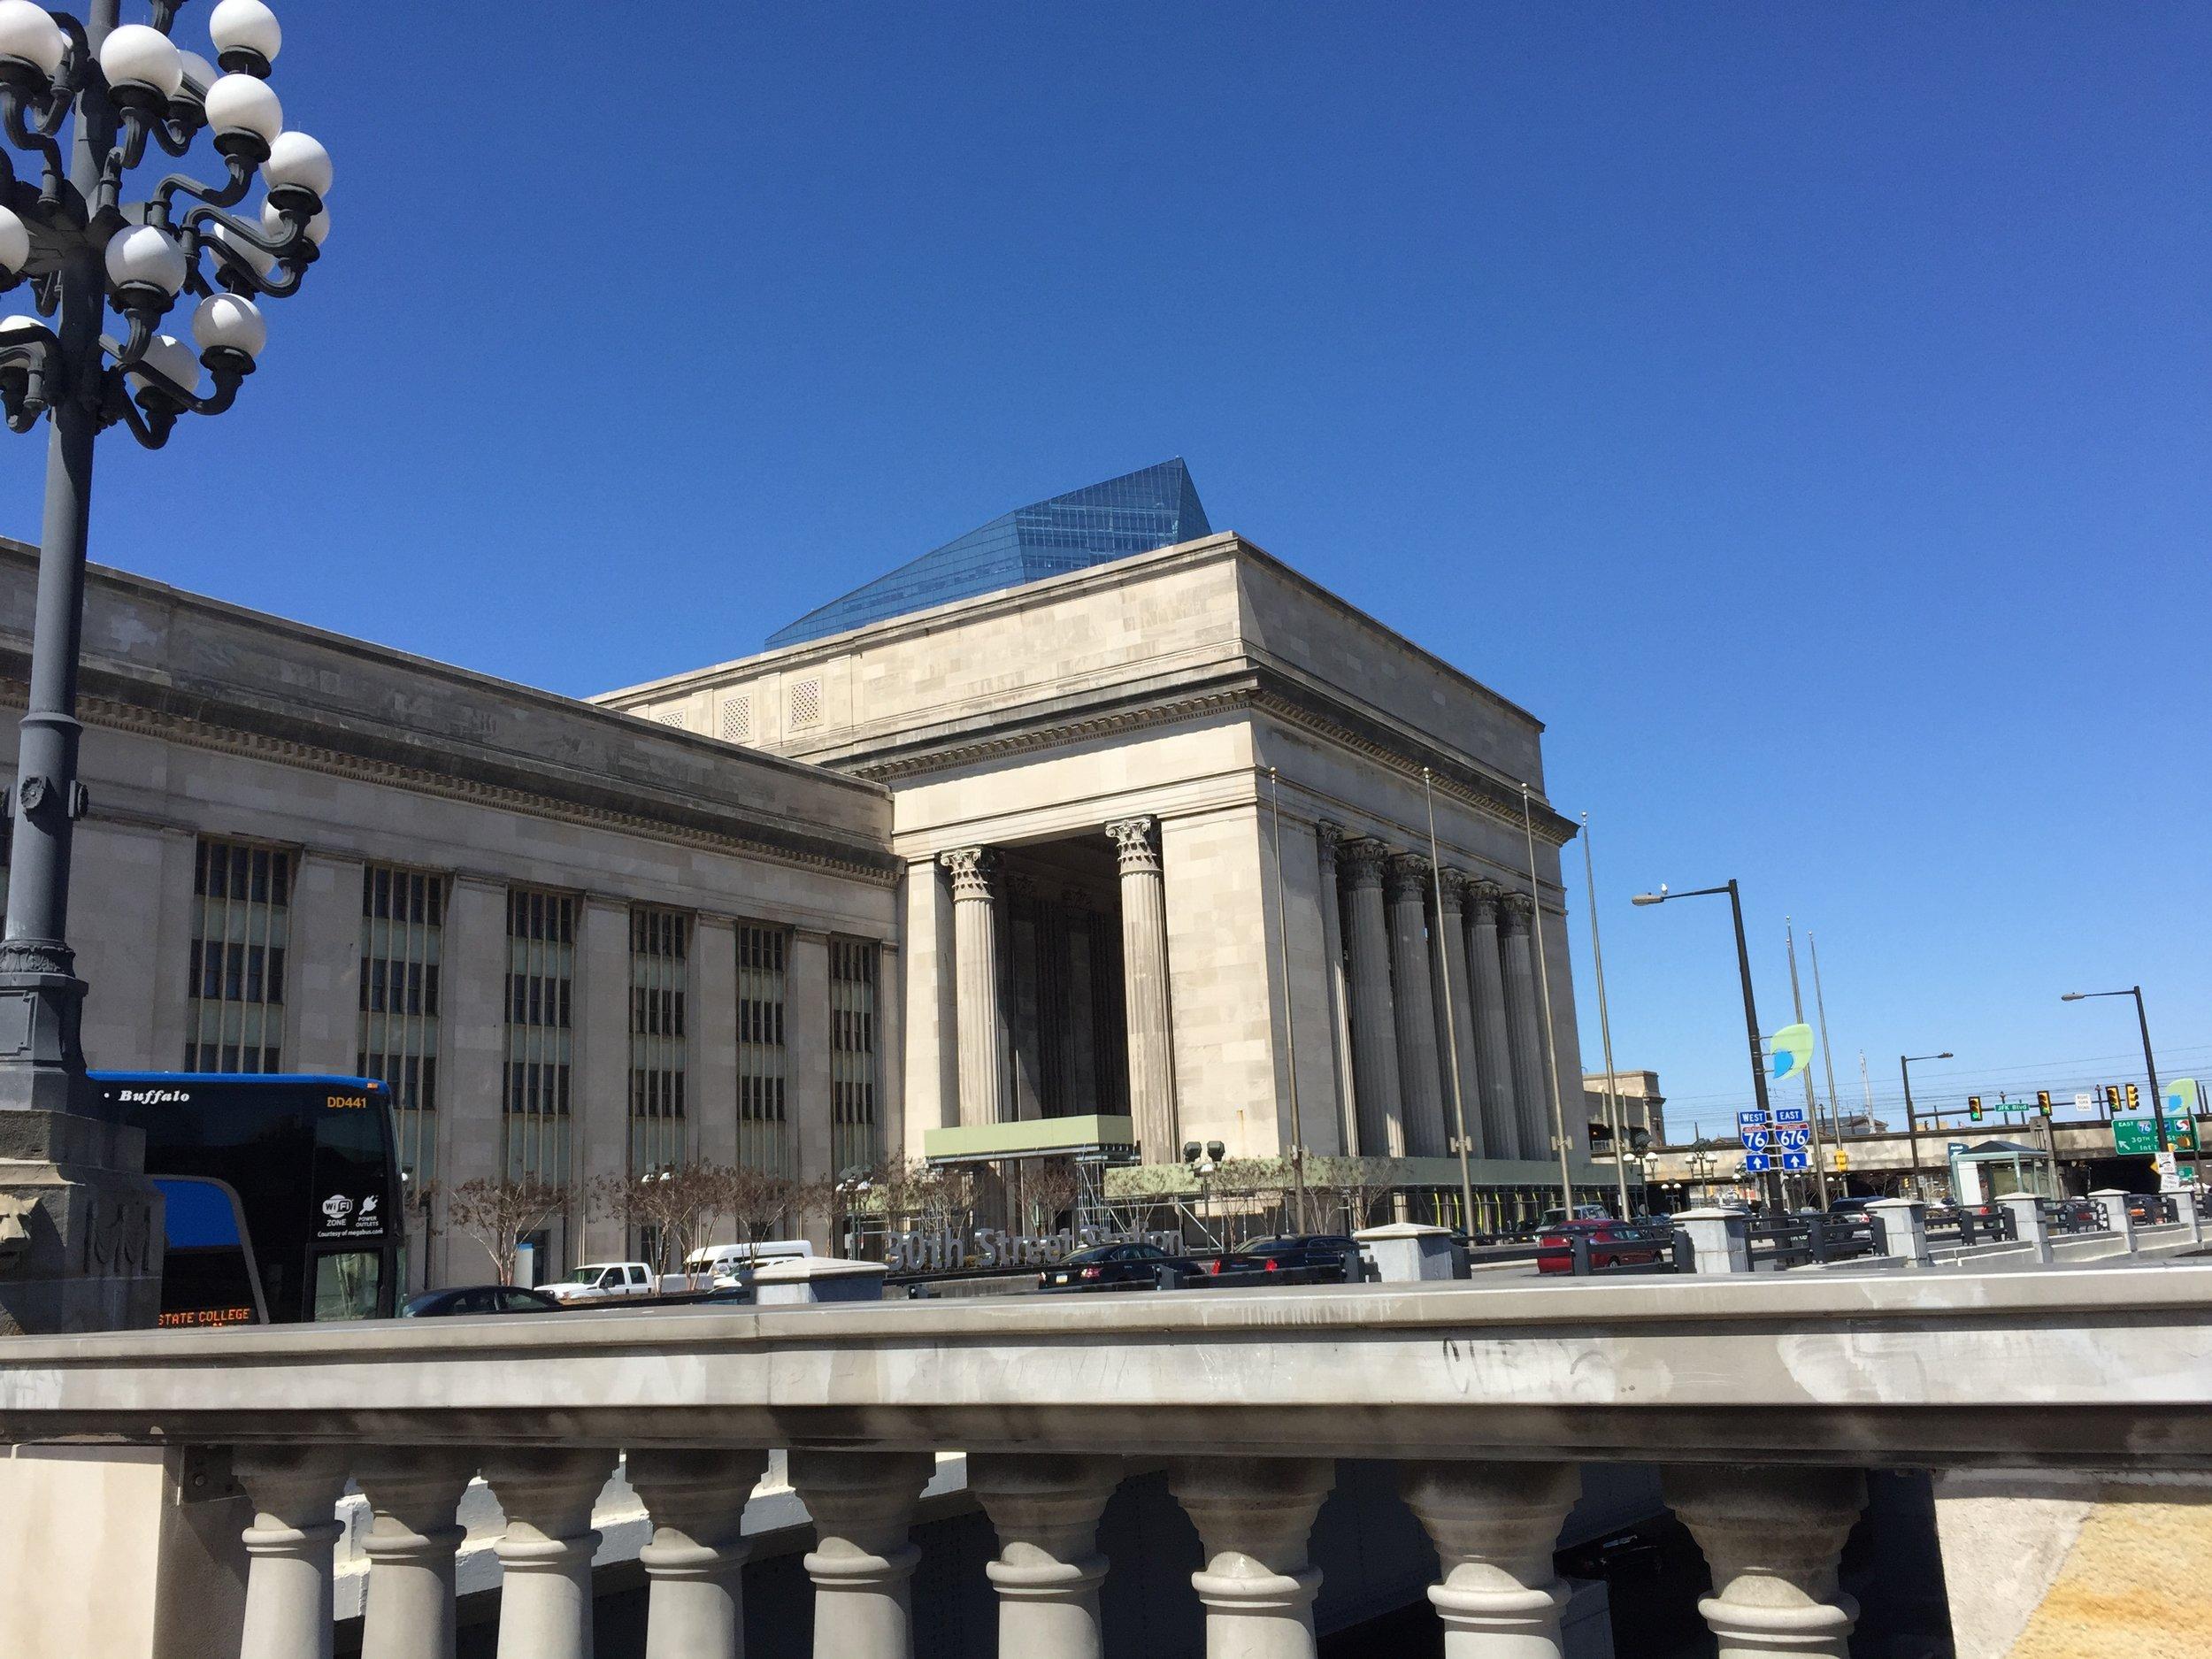 30th Street Station